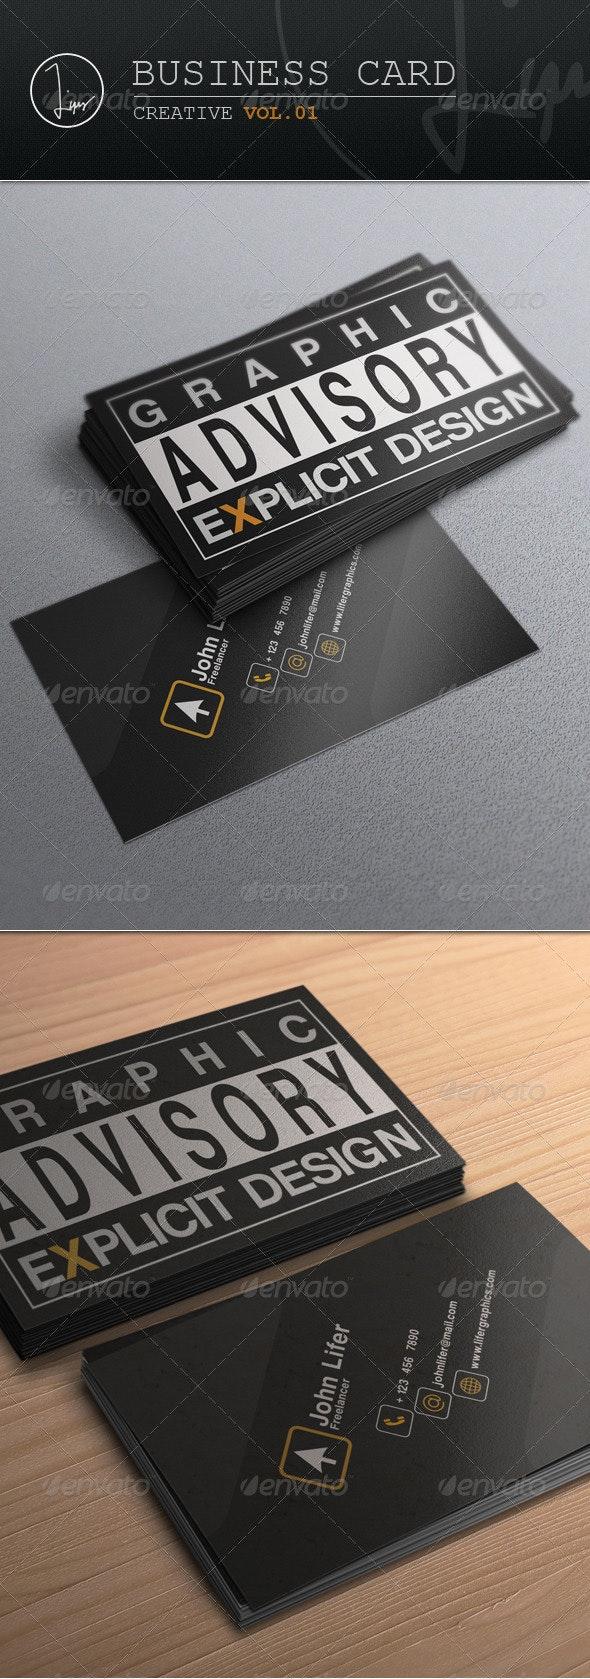 Business Card / Creative Vol.01 - Creative Business Cards